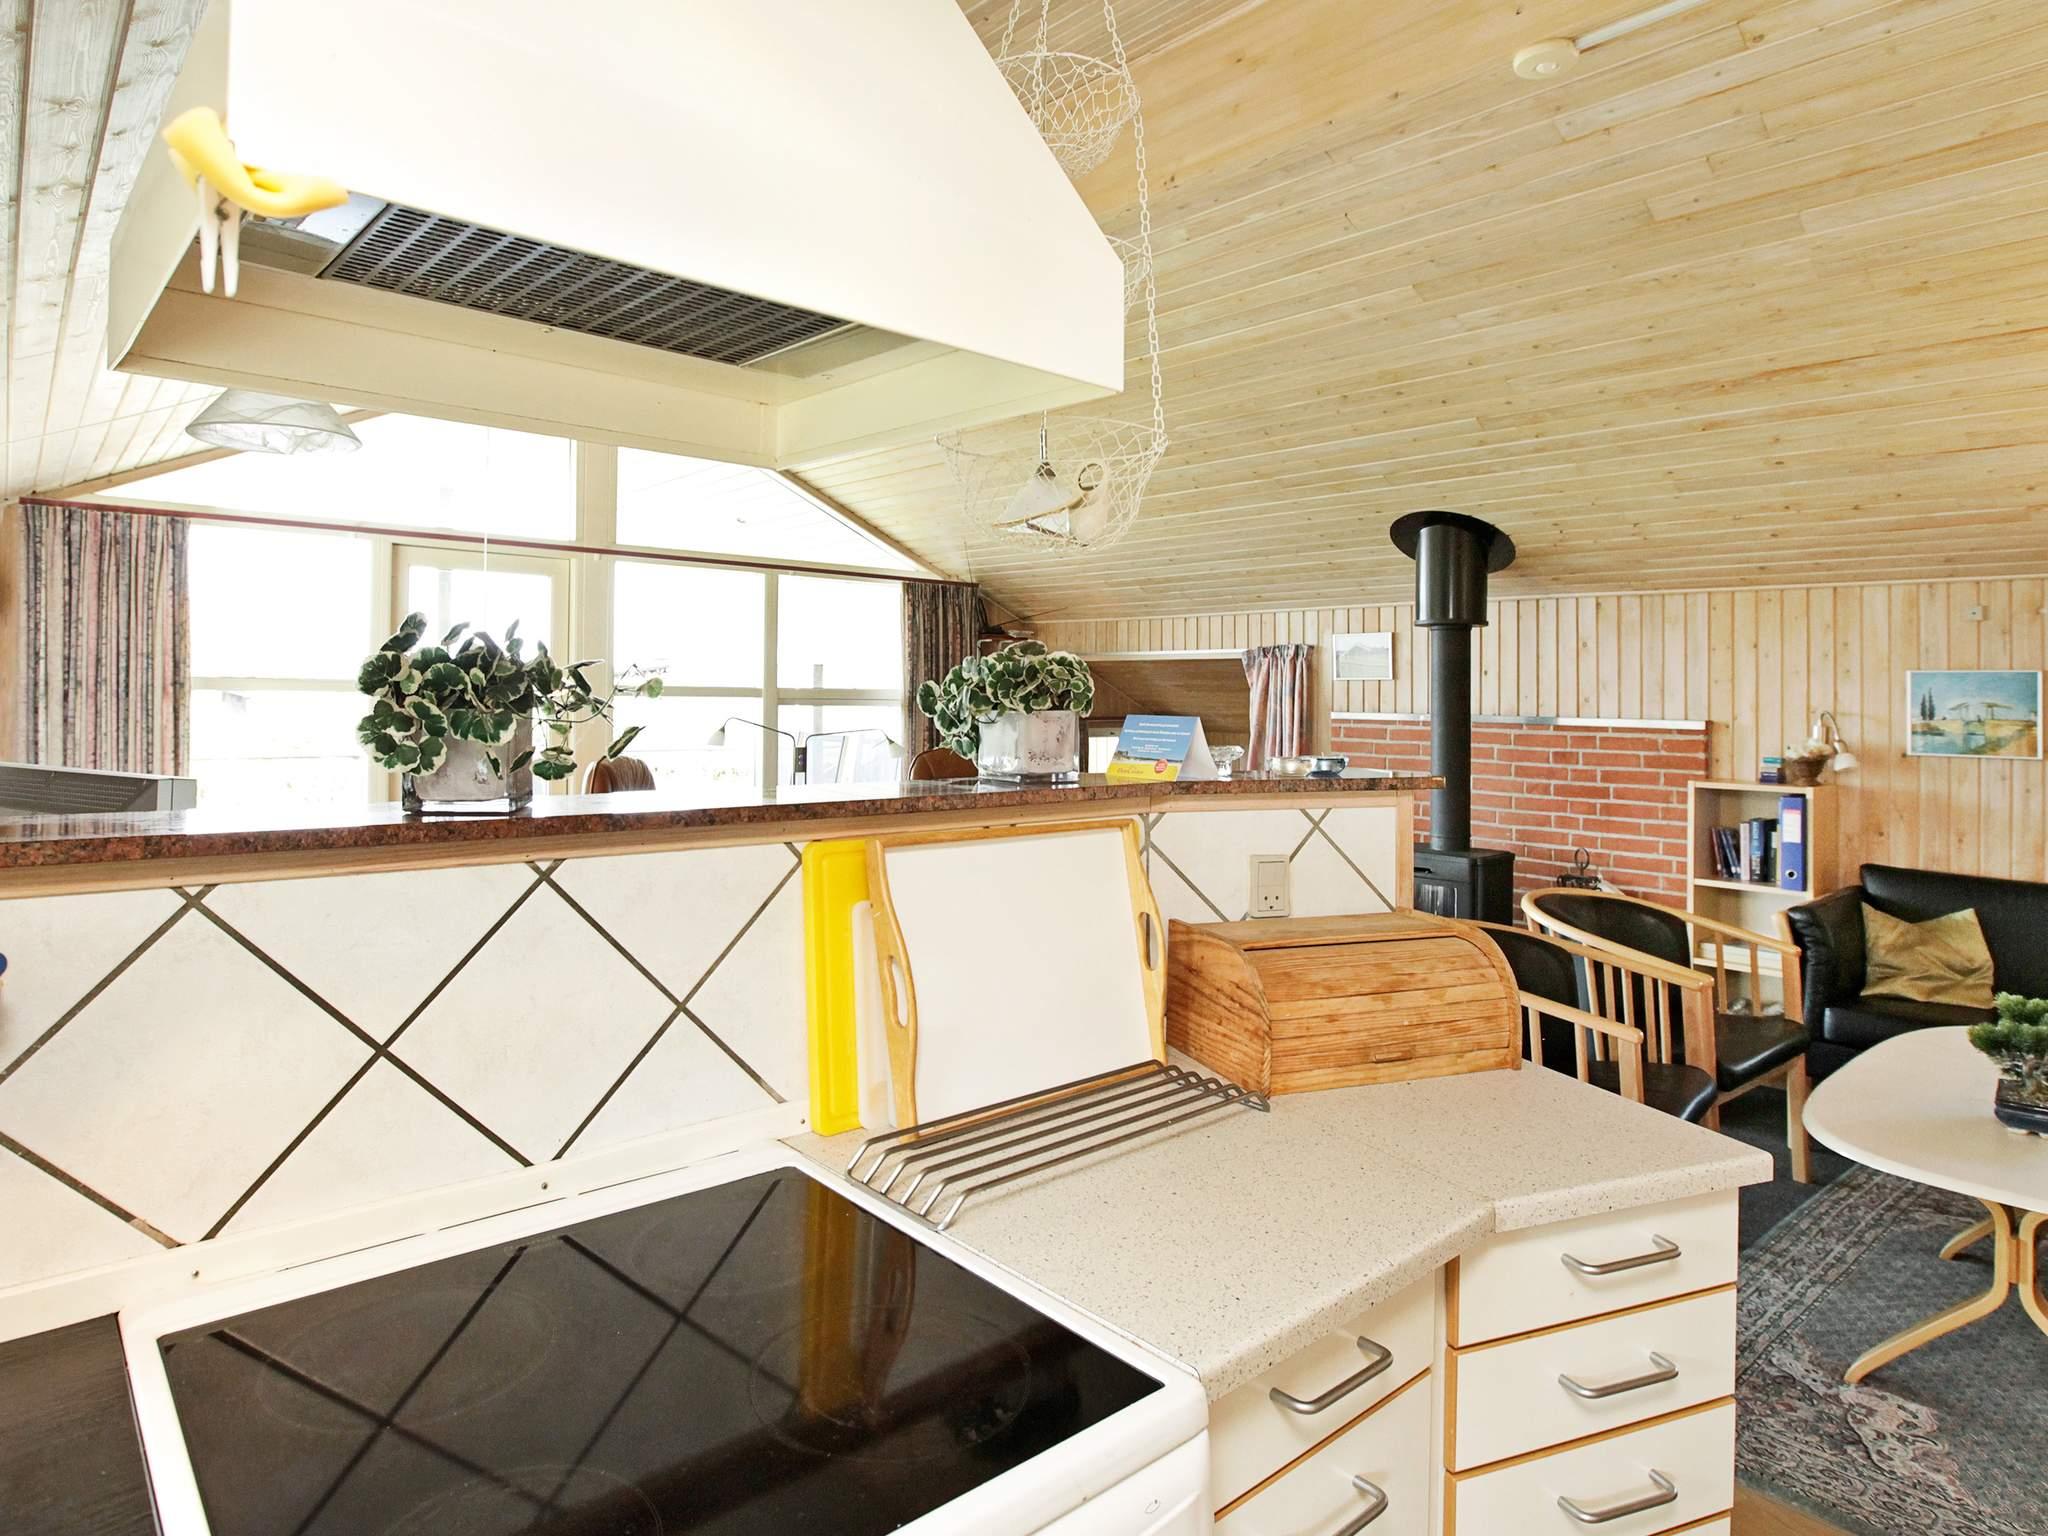 Maison de vacances Falsled (87545), Faldsled, , Fionie, Danemark, image 10